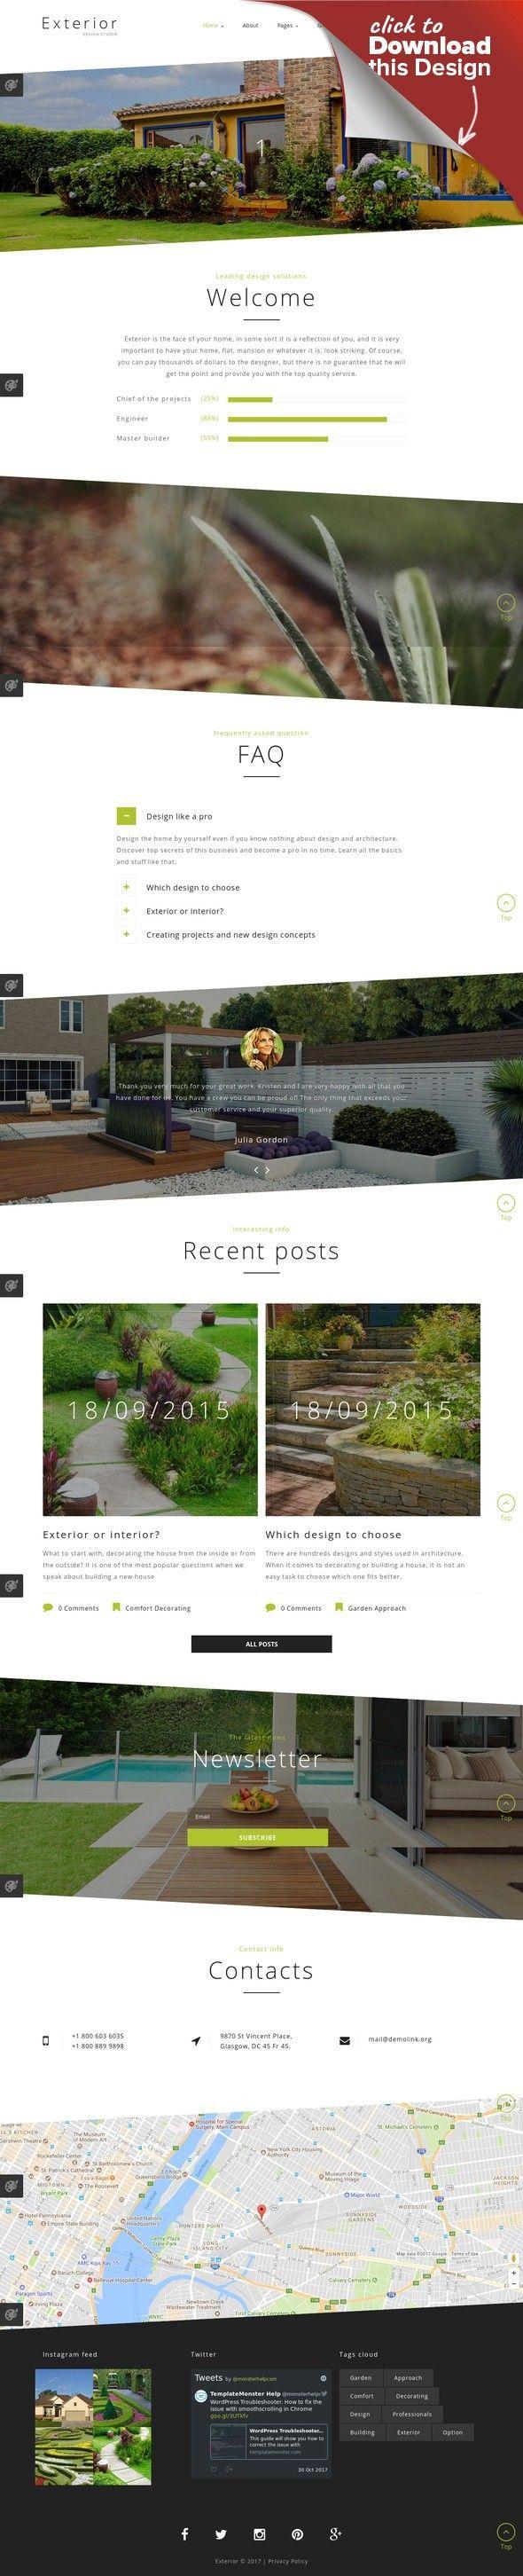 Exterior Design Studio Joomla Template CMS & Blog Templates, Joomla Templates, Design & Photography, Design, Exterior Design Templates